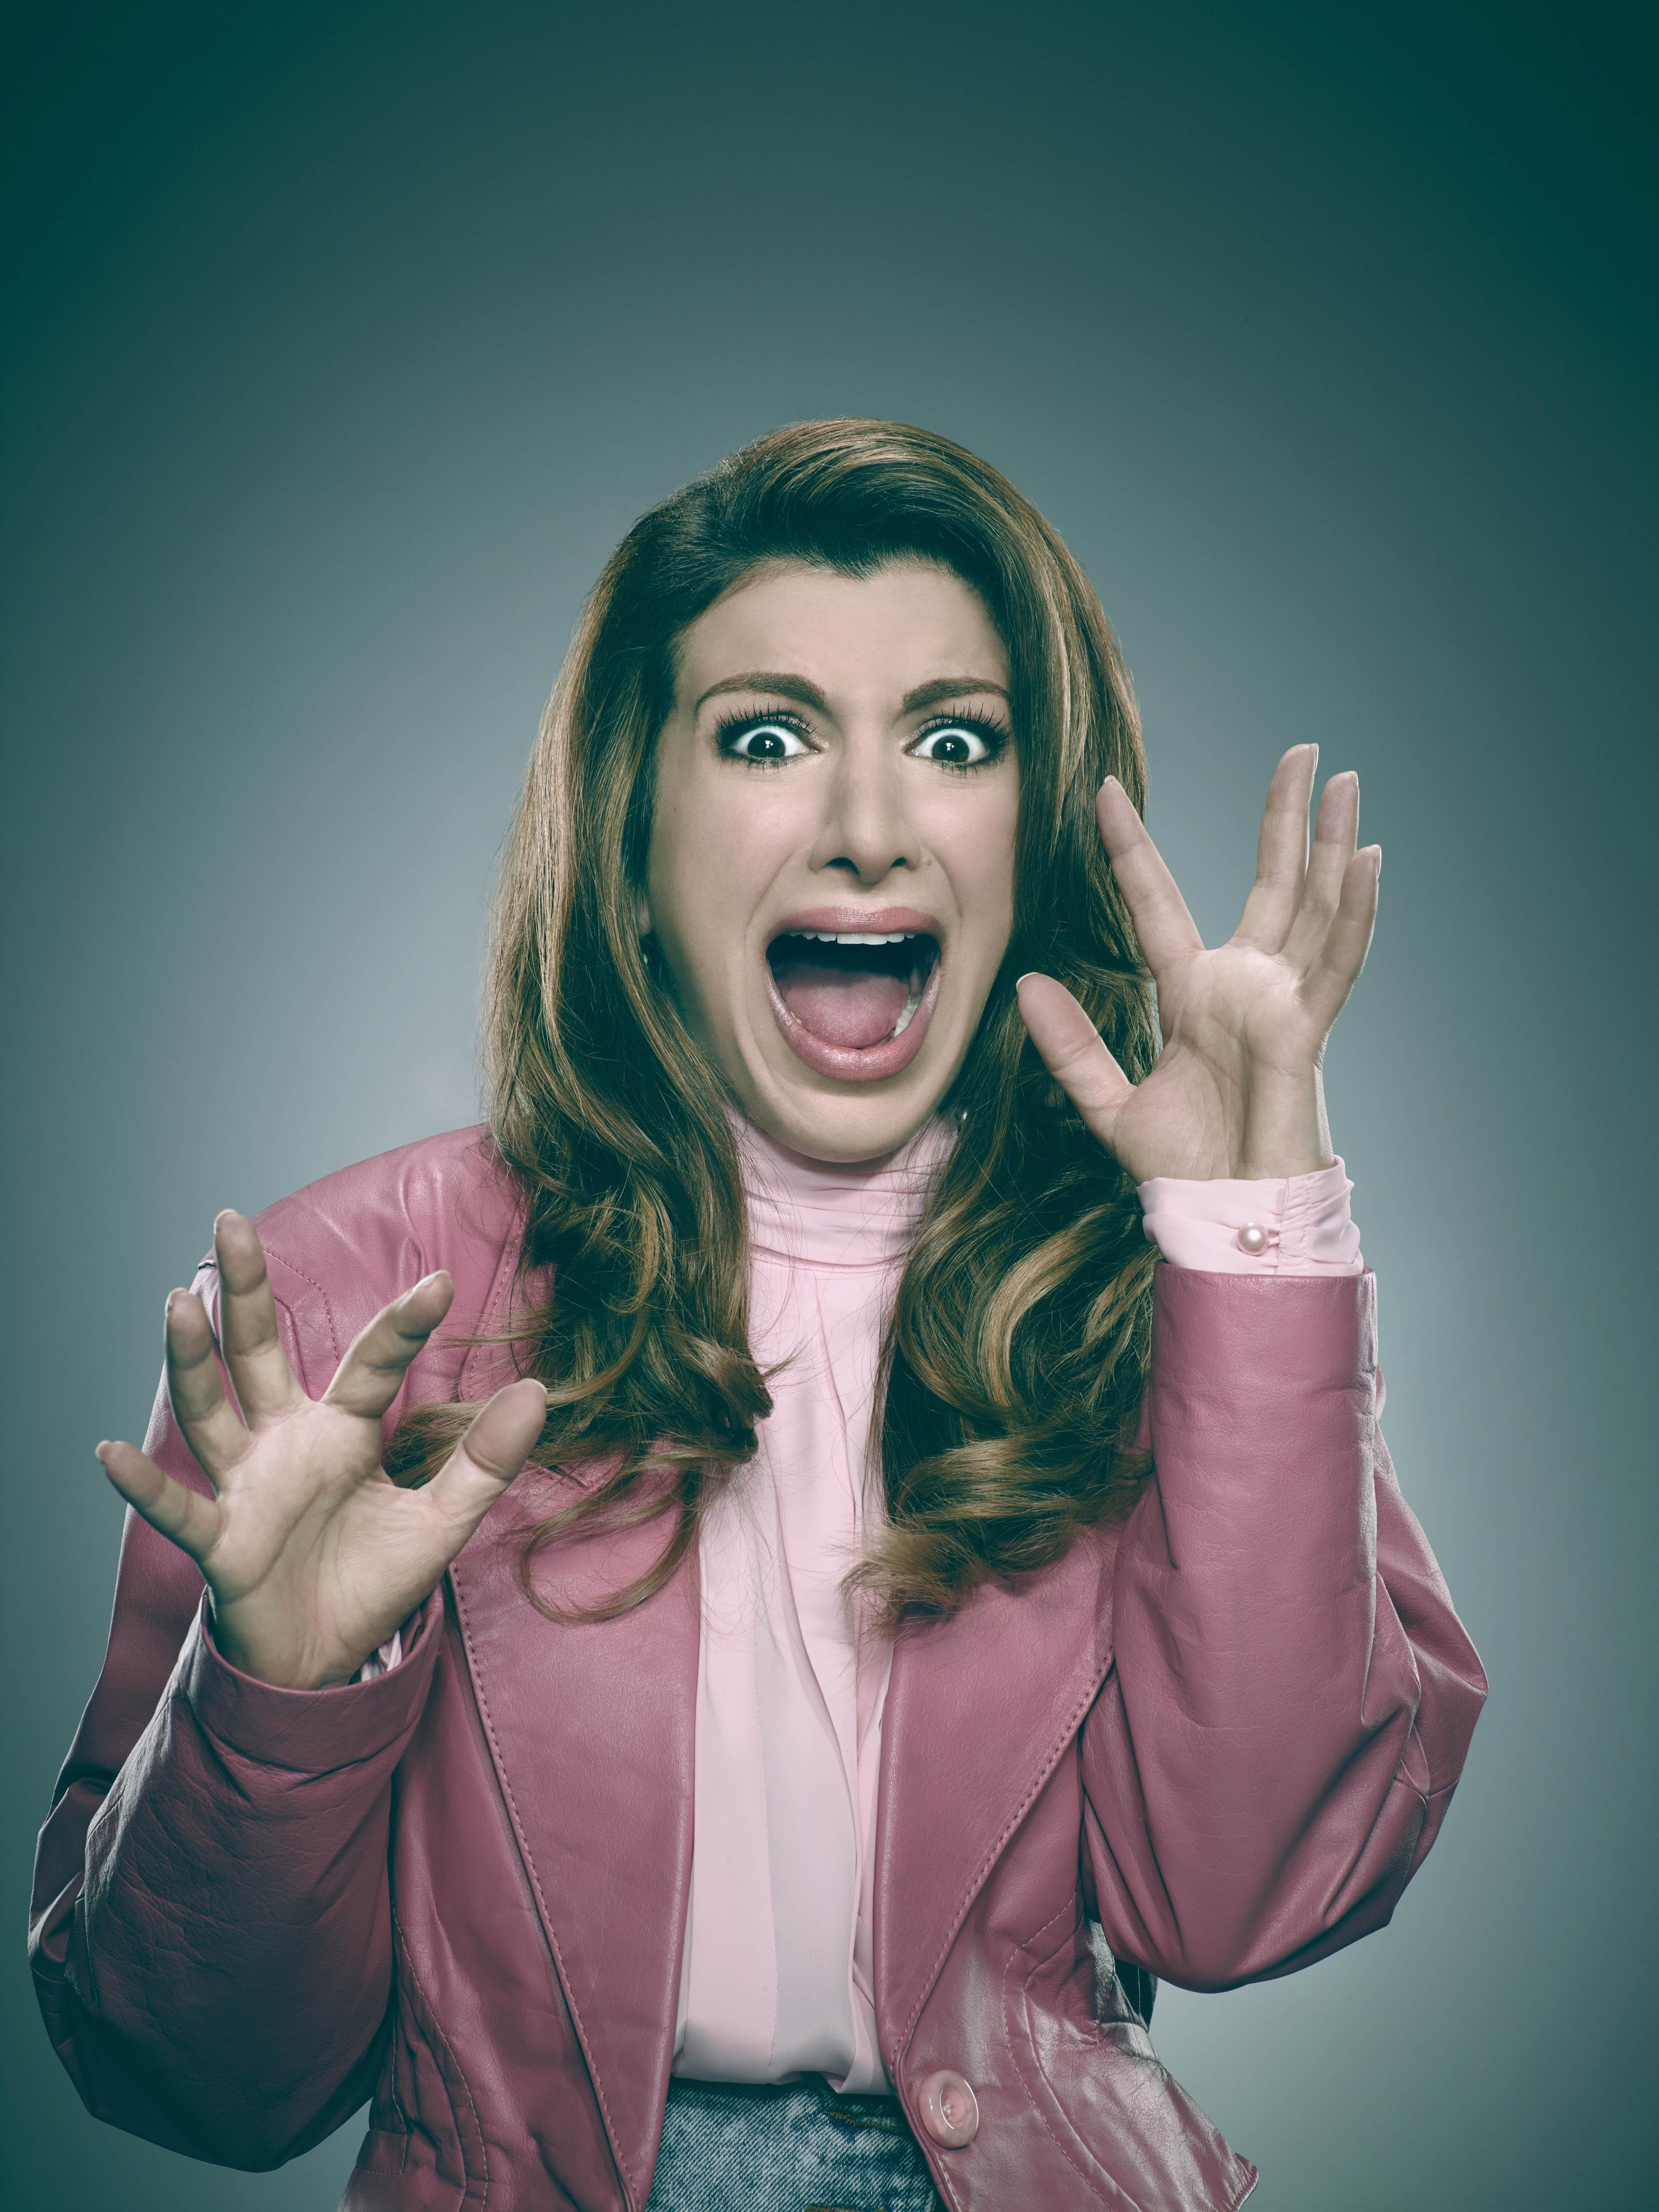 Scream Queens - Season 1 Portrait - Nasim Pedrad as Gigi Caldwell